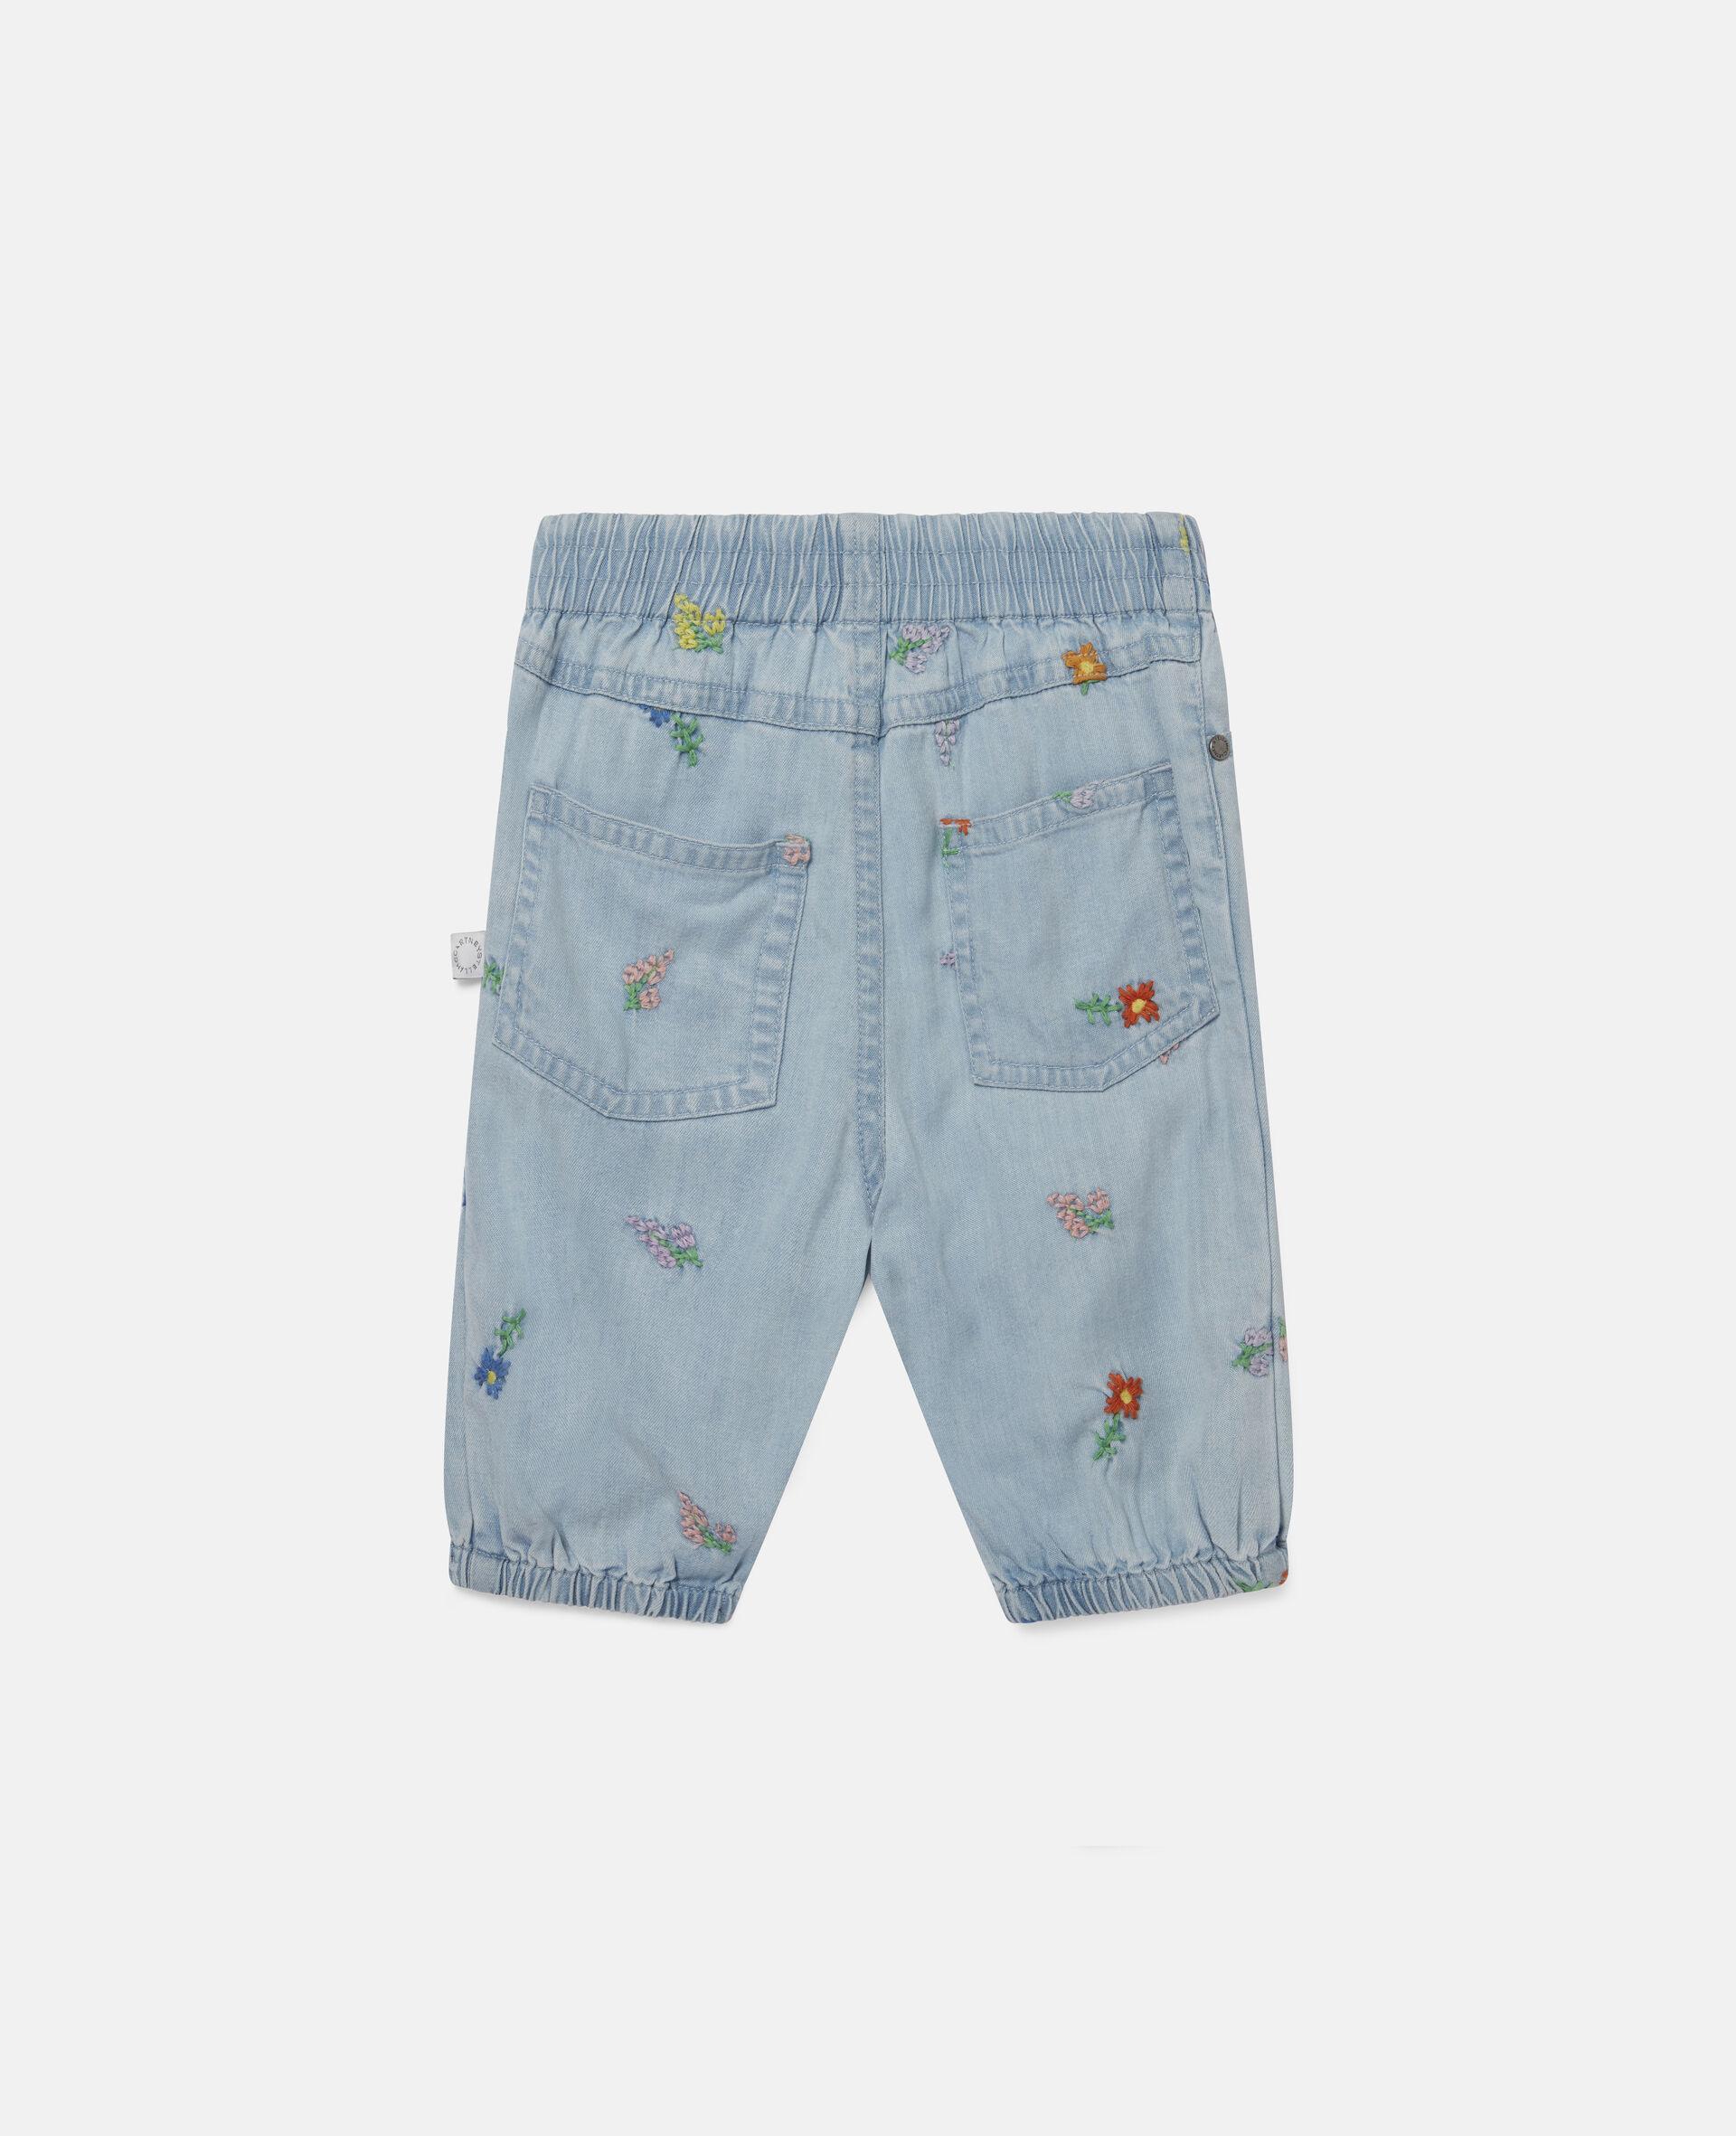 Jeans in Denim con Fiori Ricamati-Blu-large image number 3